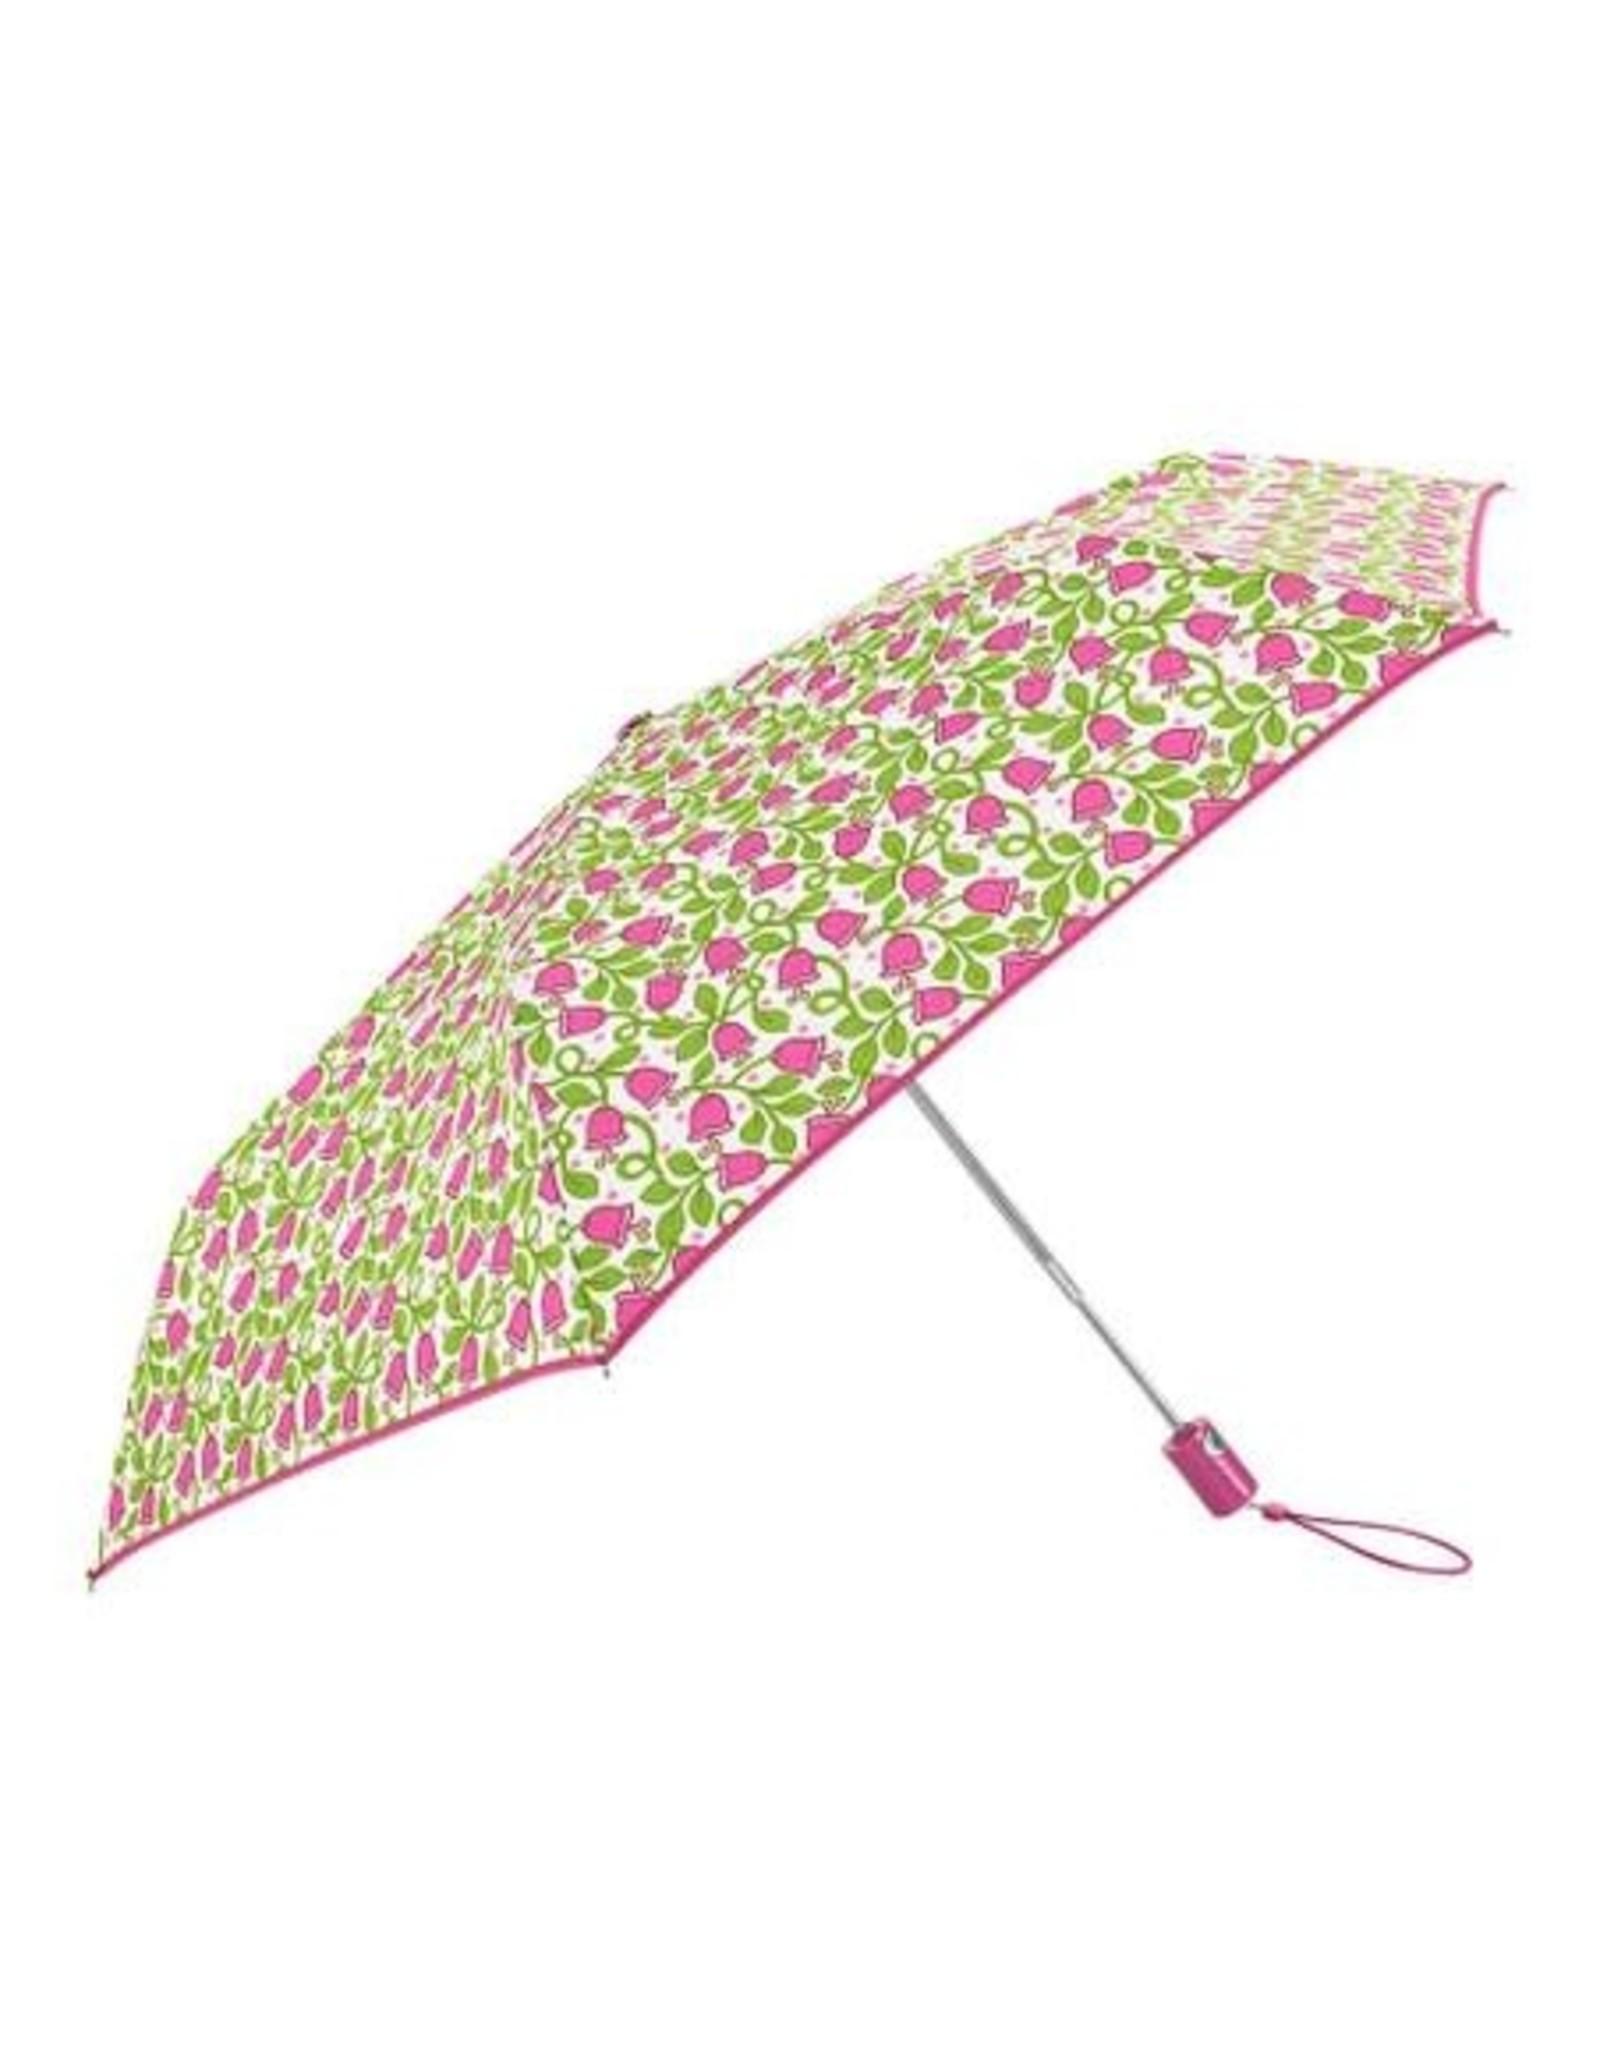 Vera Bradley Umbrella in Lilli Bell